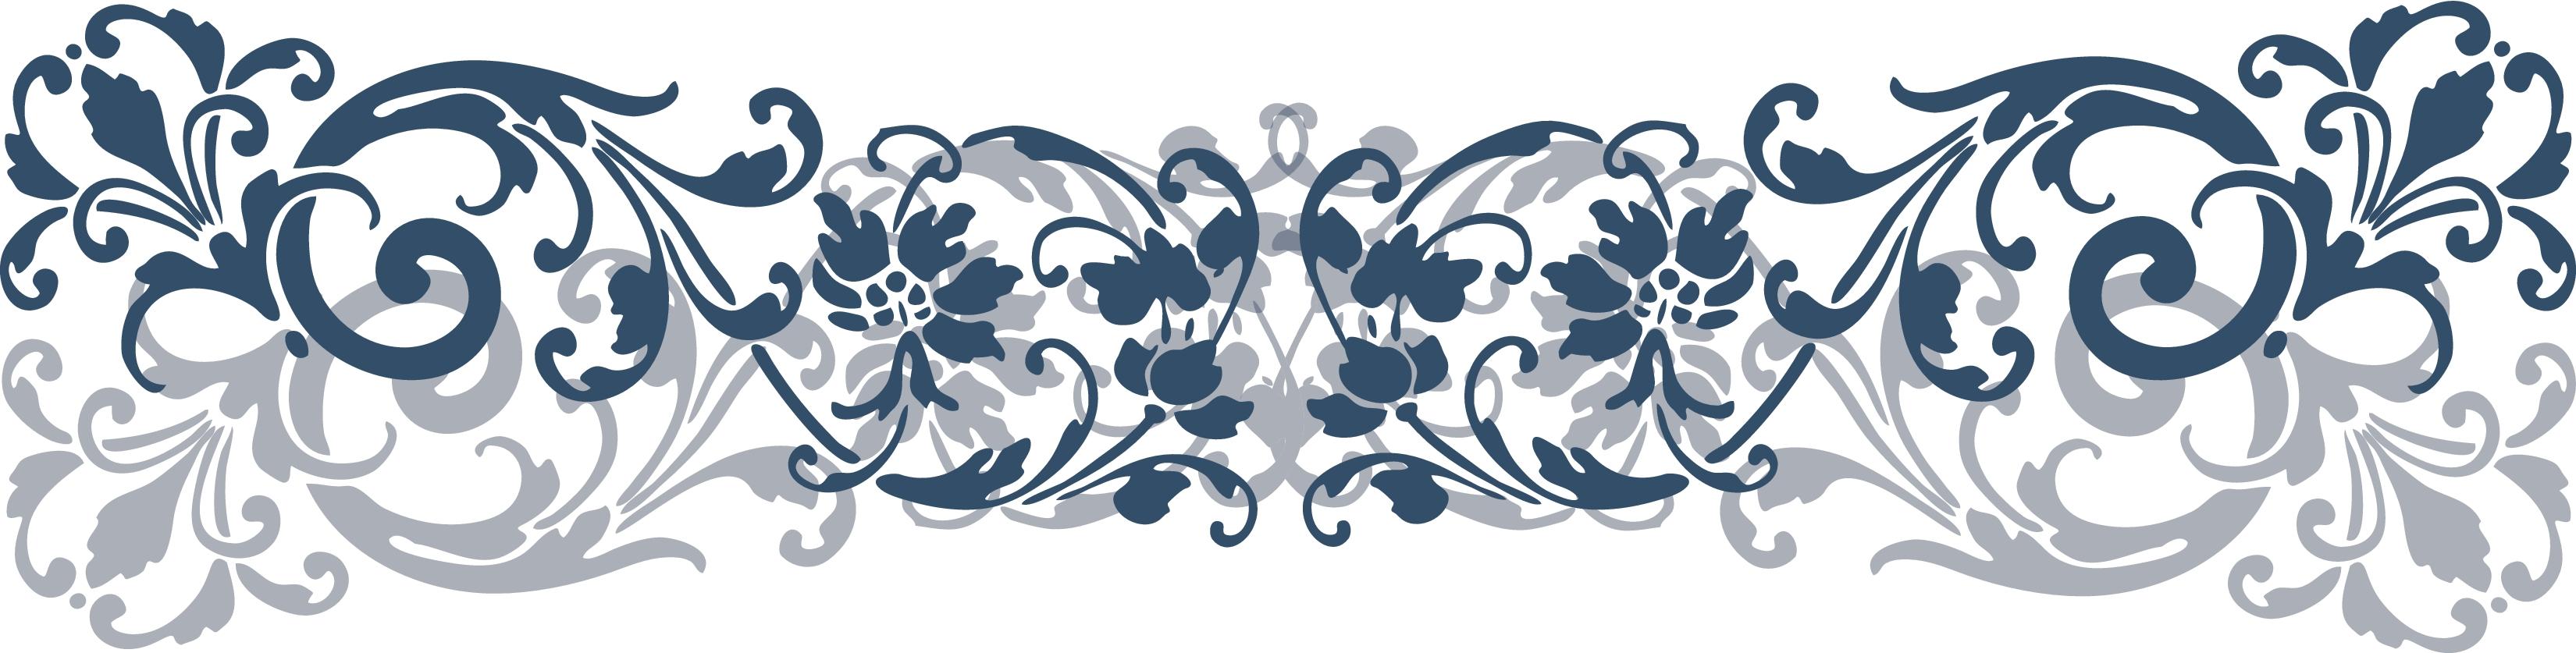 3300x837 Scroll Clipart Floral Scroll